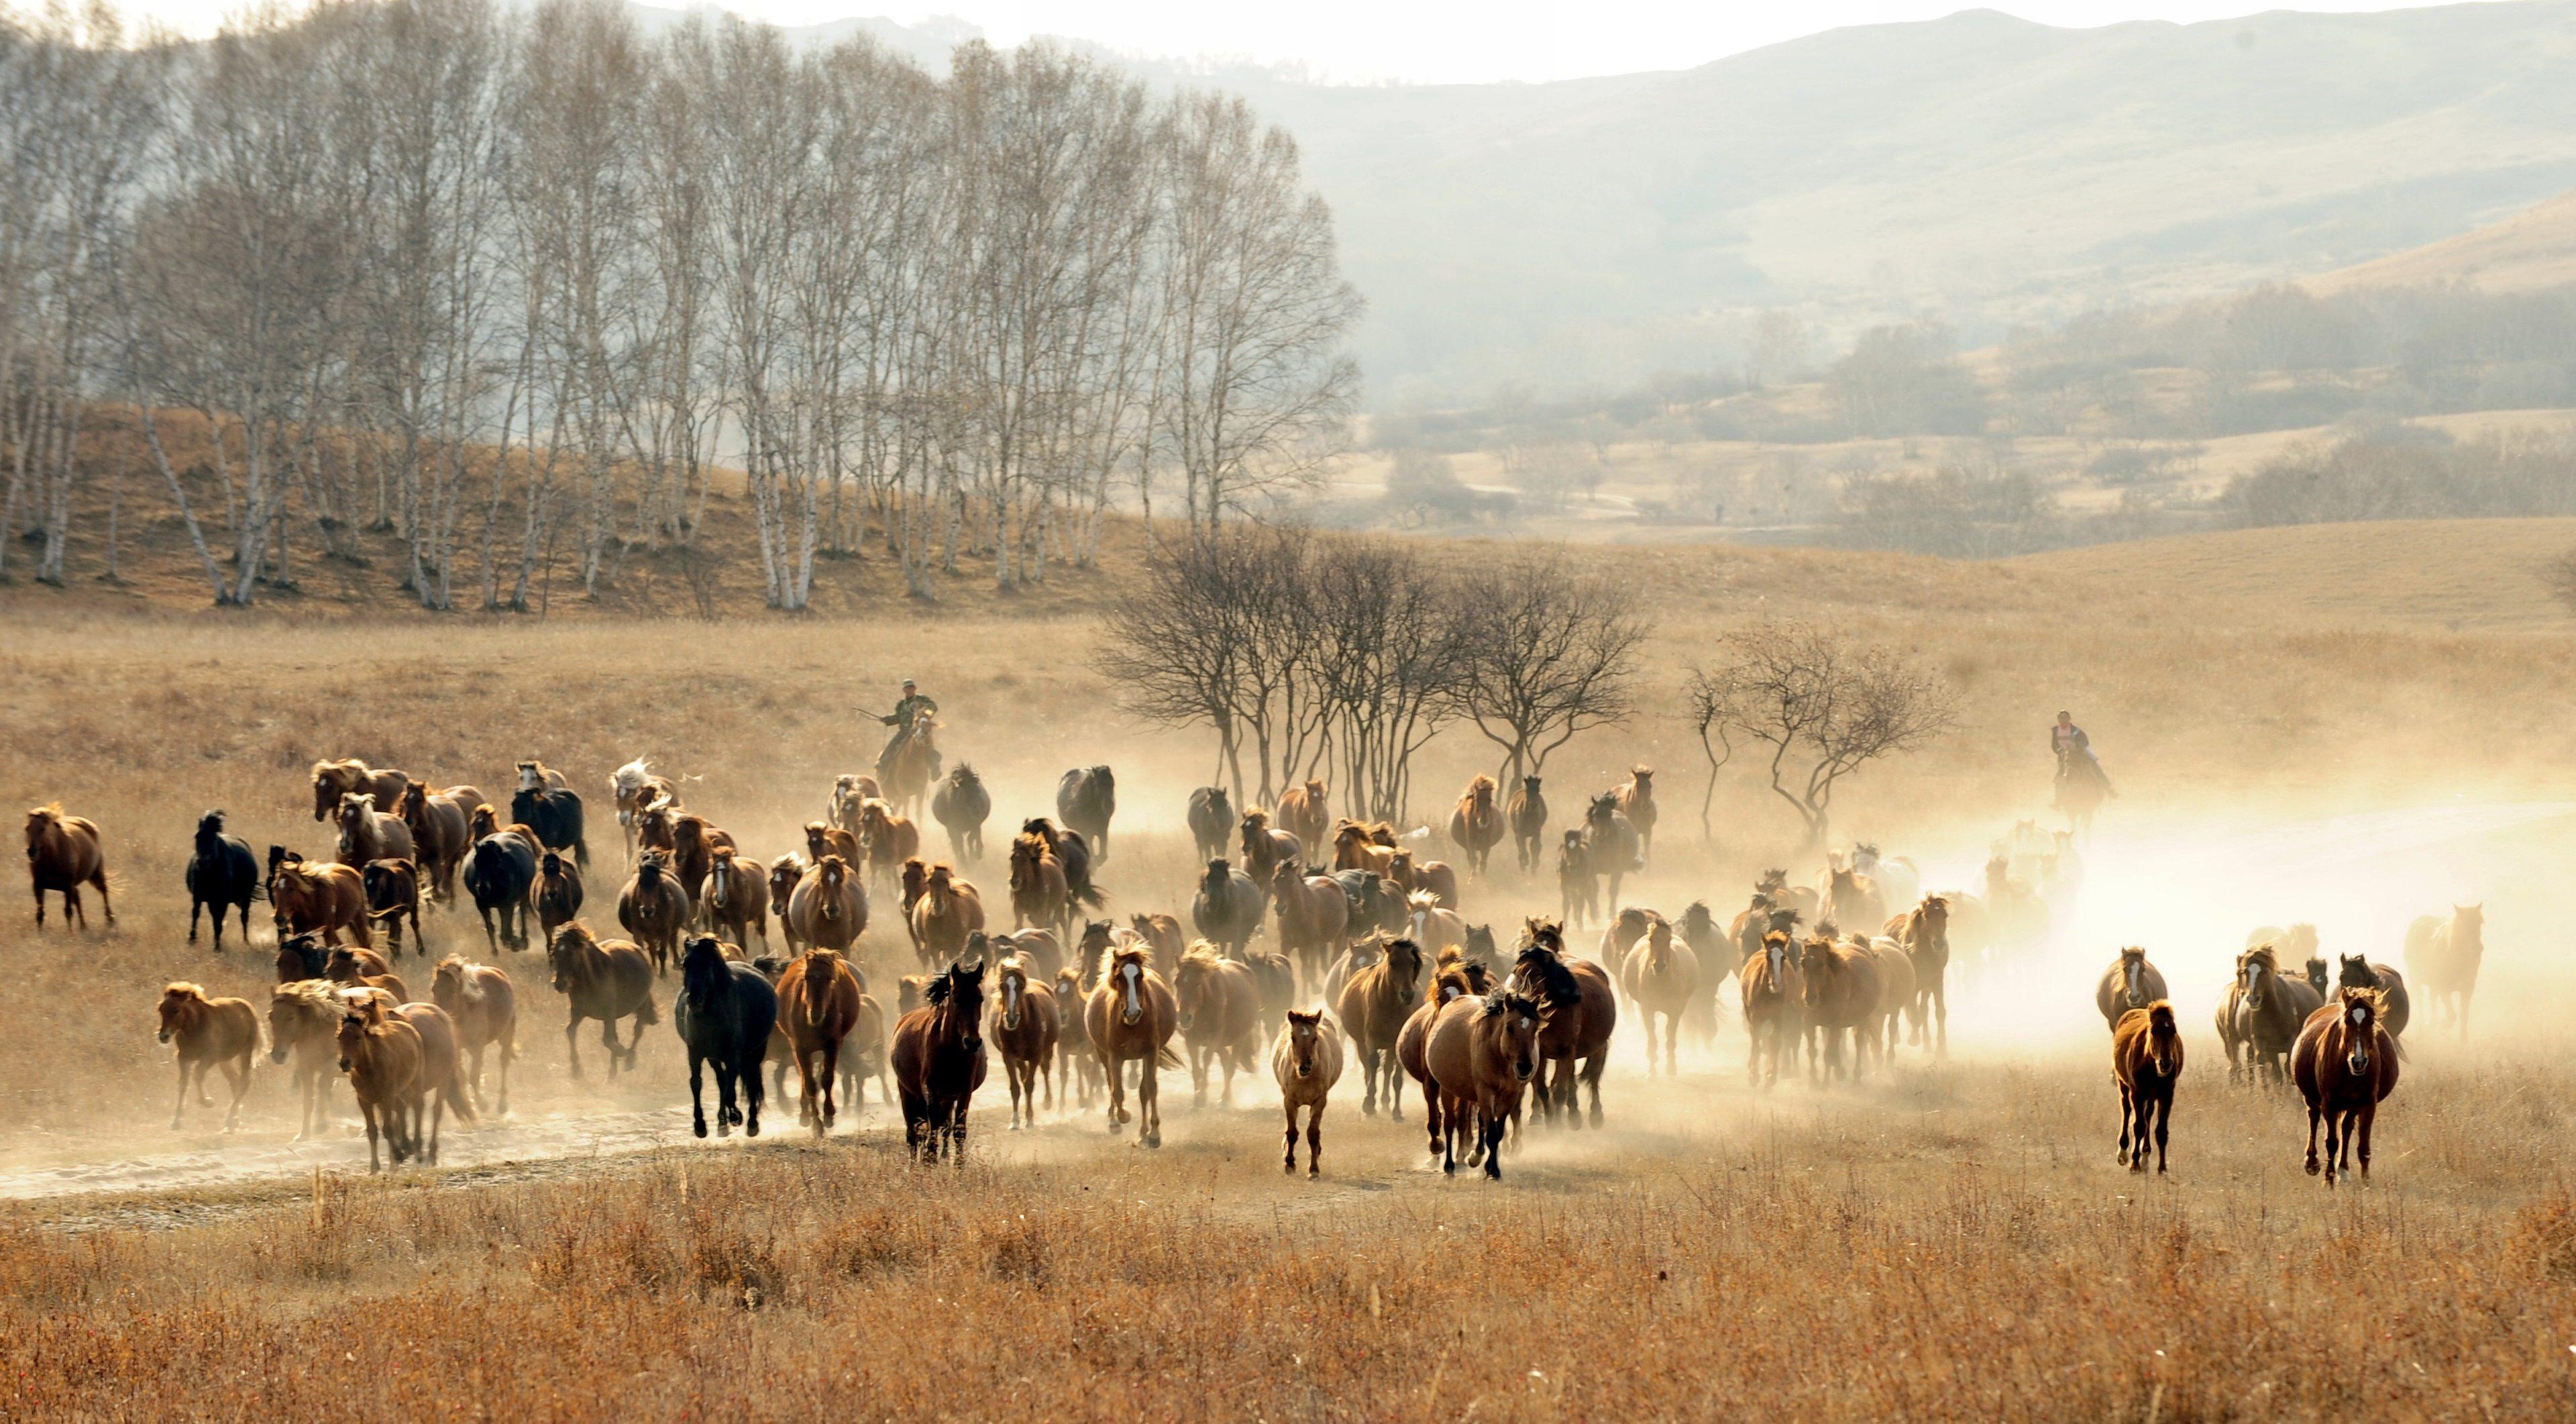 Group Of Wild Horse Running Wallpaper 4k Width 240 Fast Can A Horse Run 3840x2122 Wallpaper Teahub Io